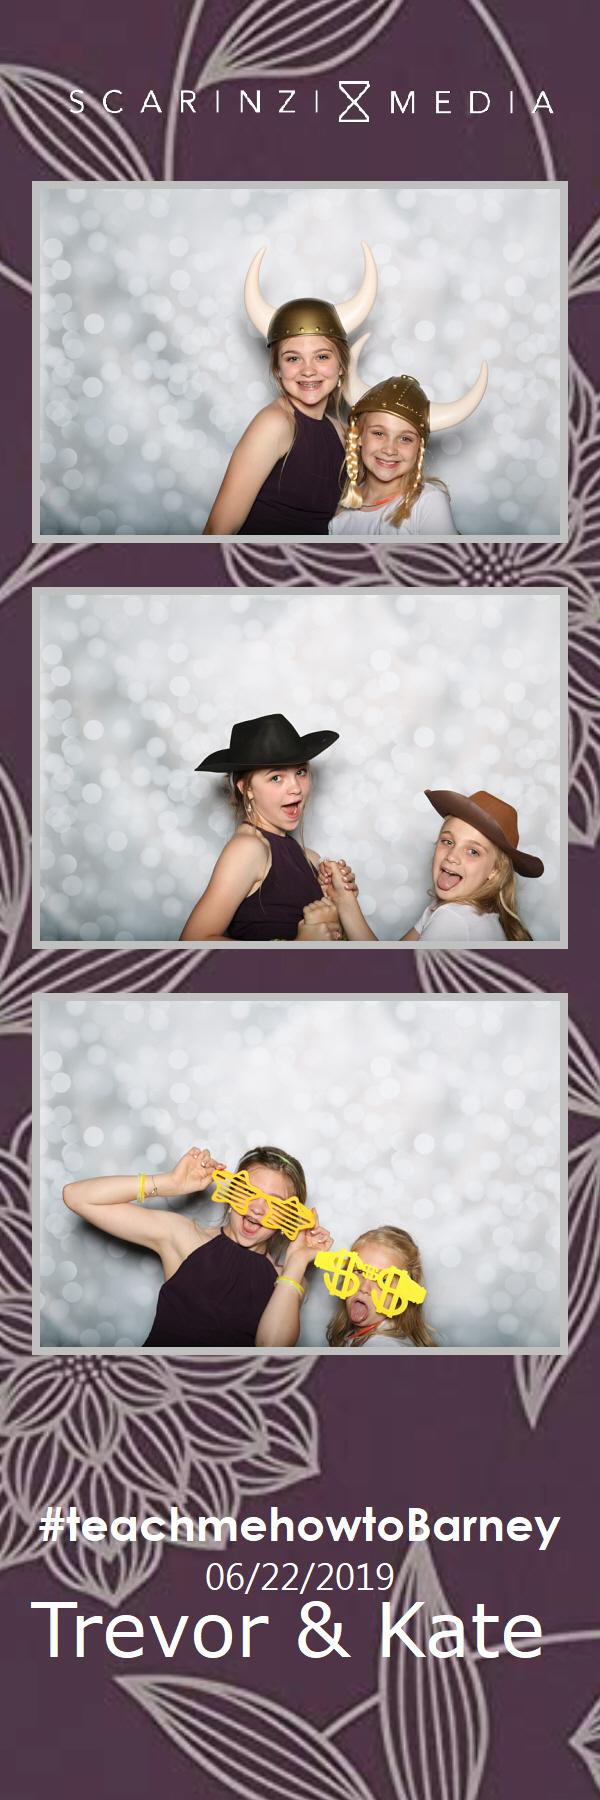 2019.06.22 - Barney Wedding PHOTOBOOTH83.jpg